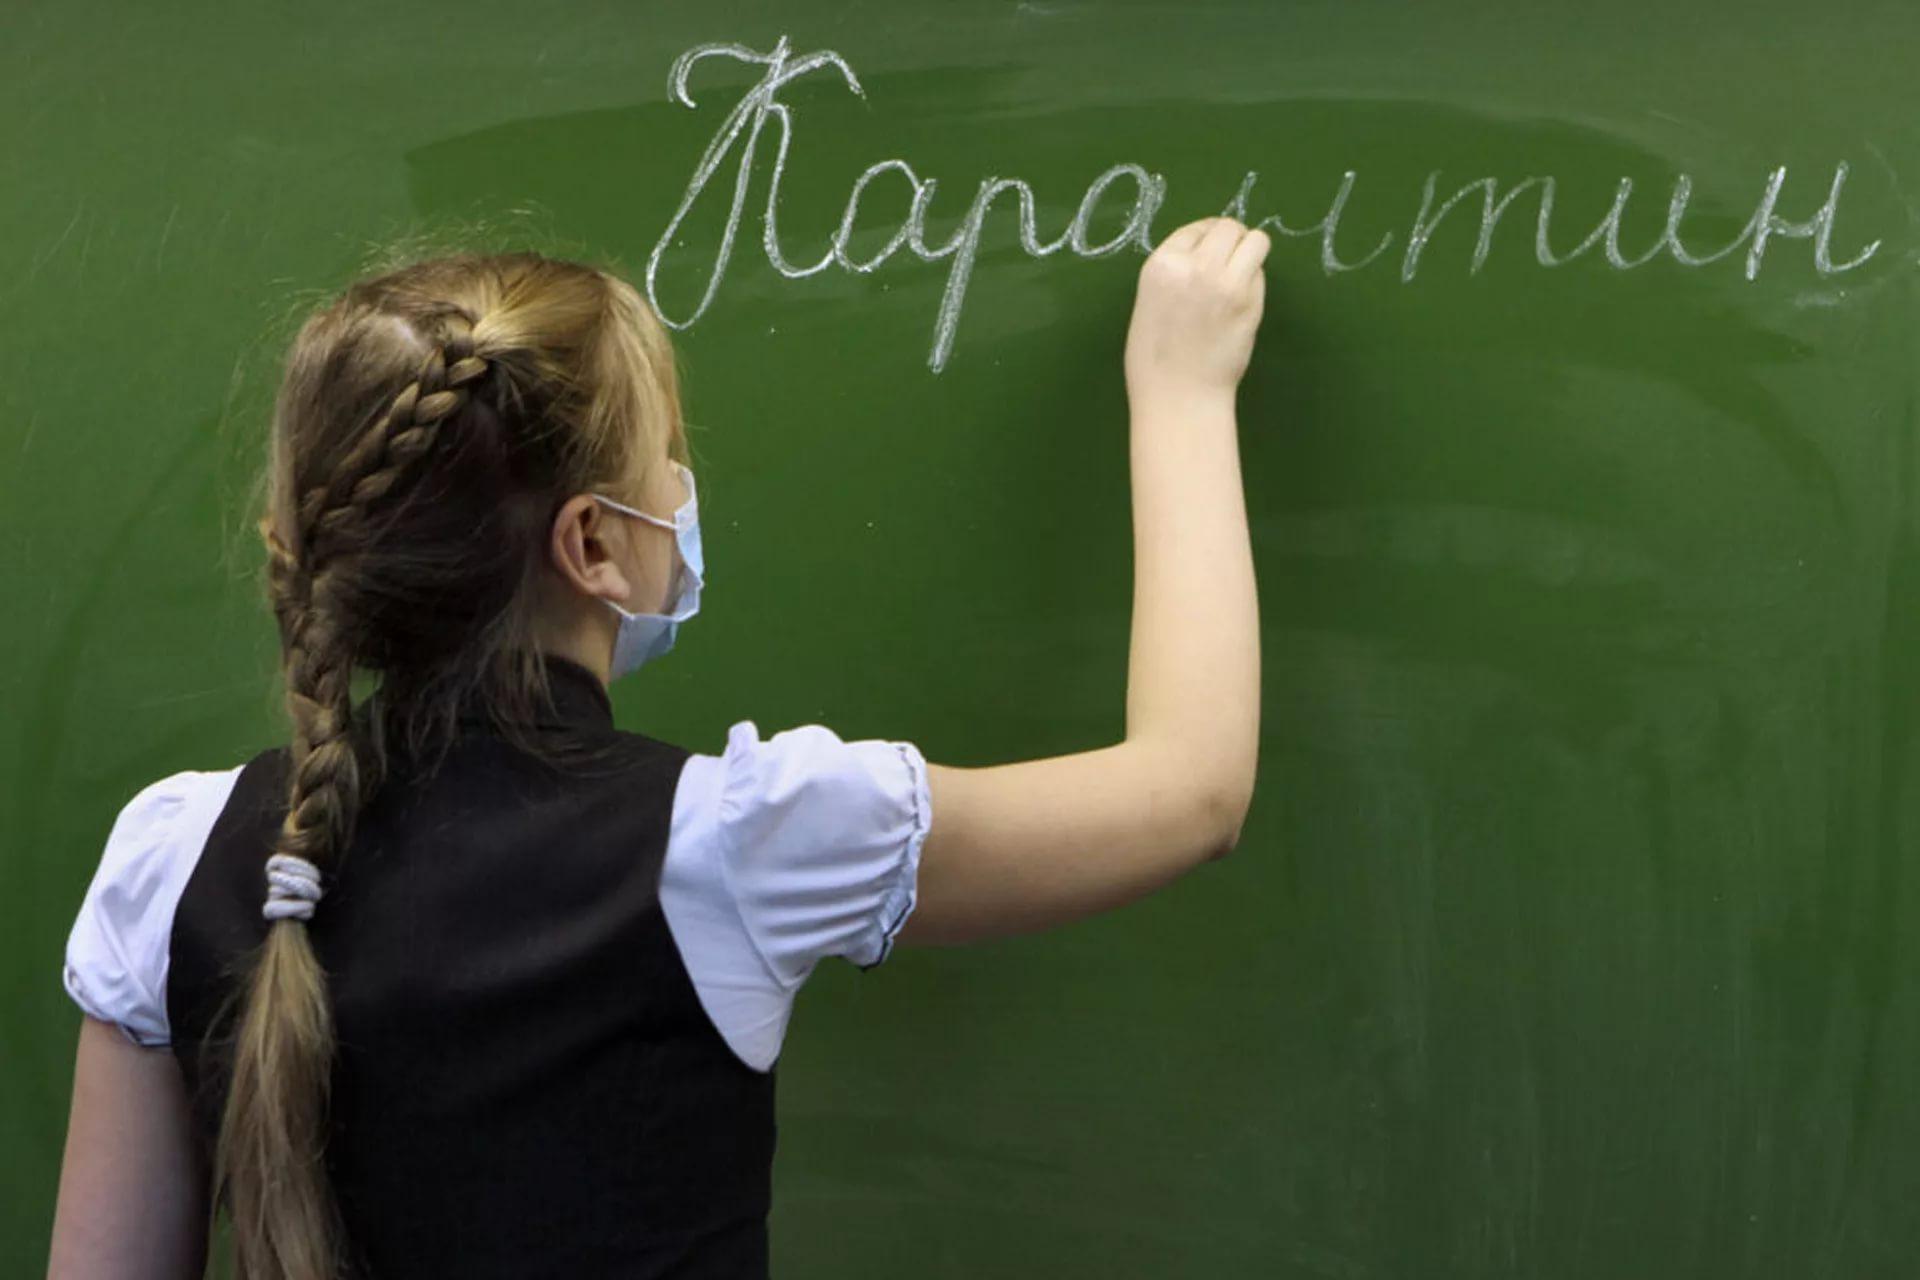 Школы в России не будут переводиться на удалёнку